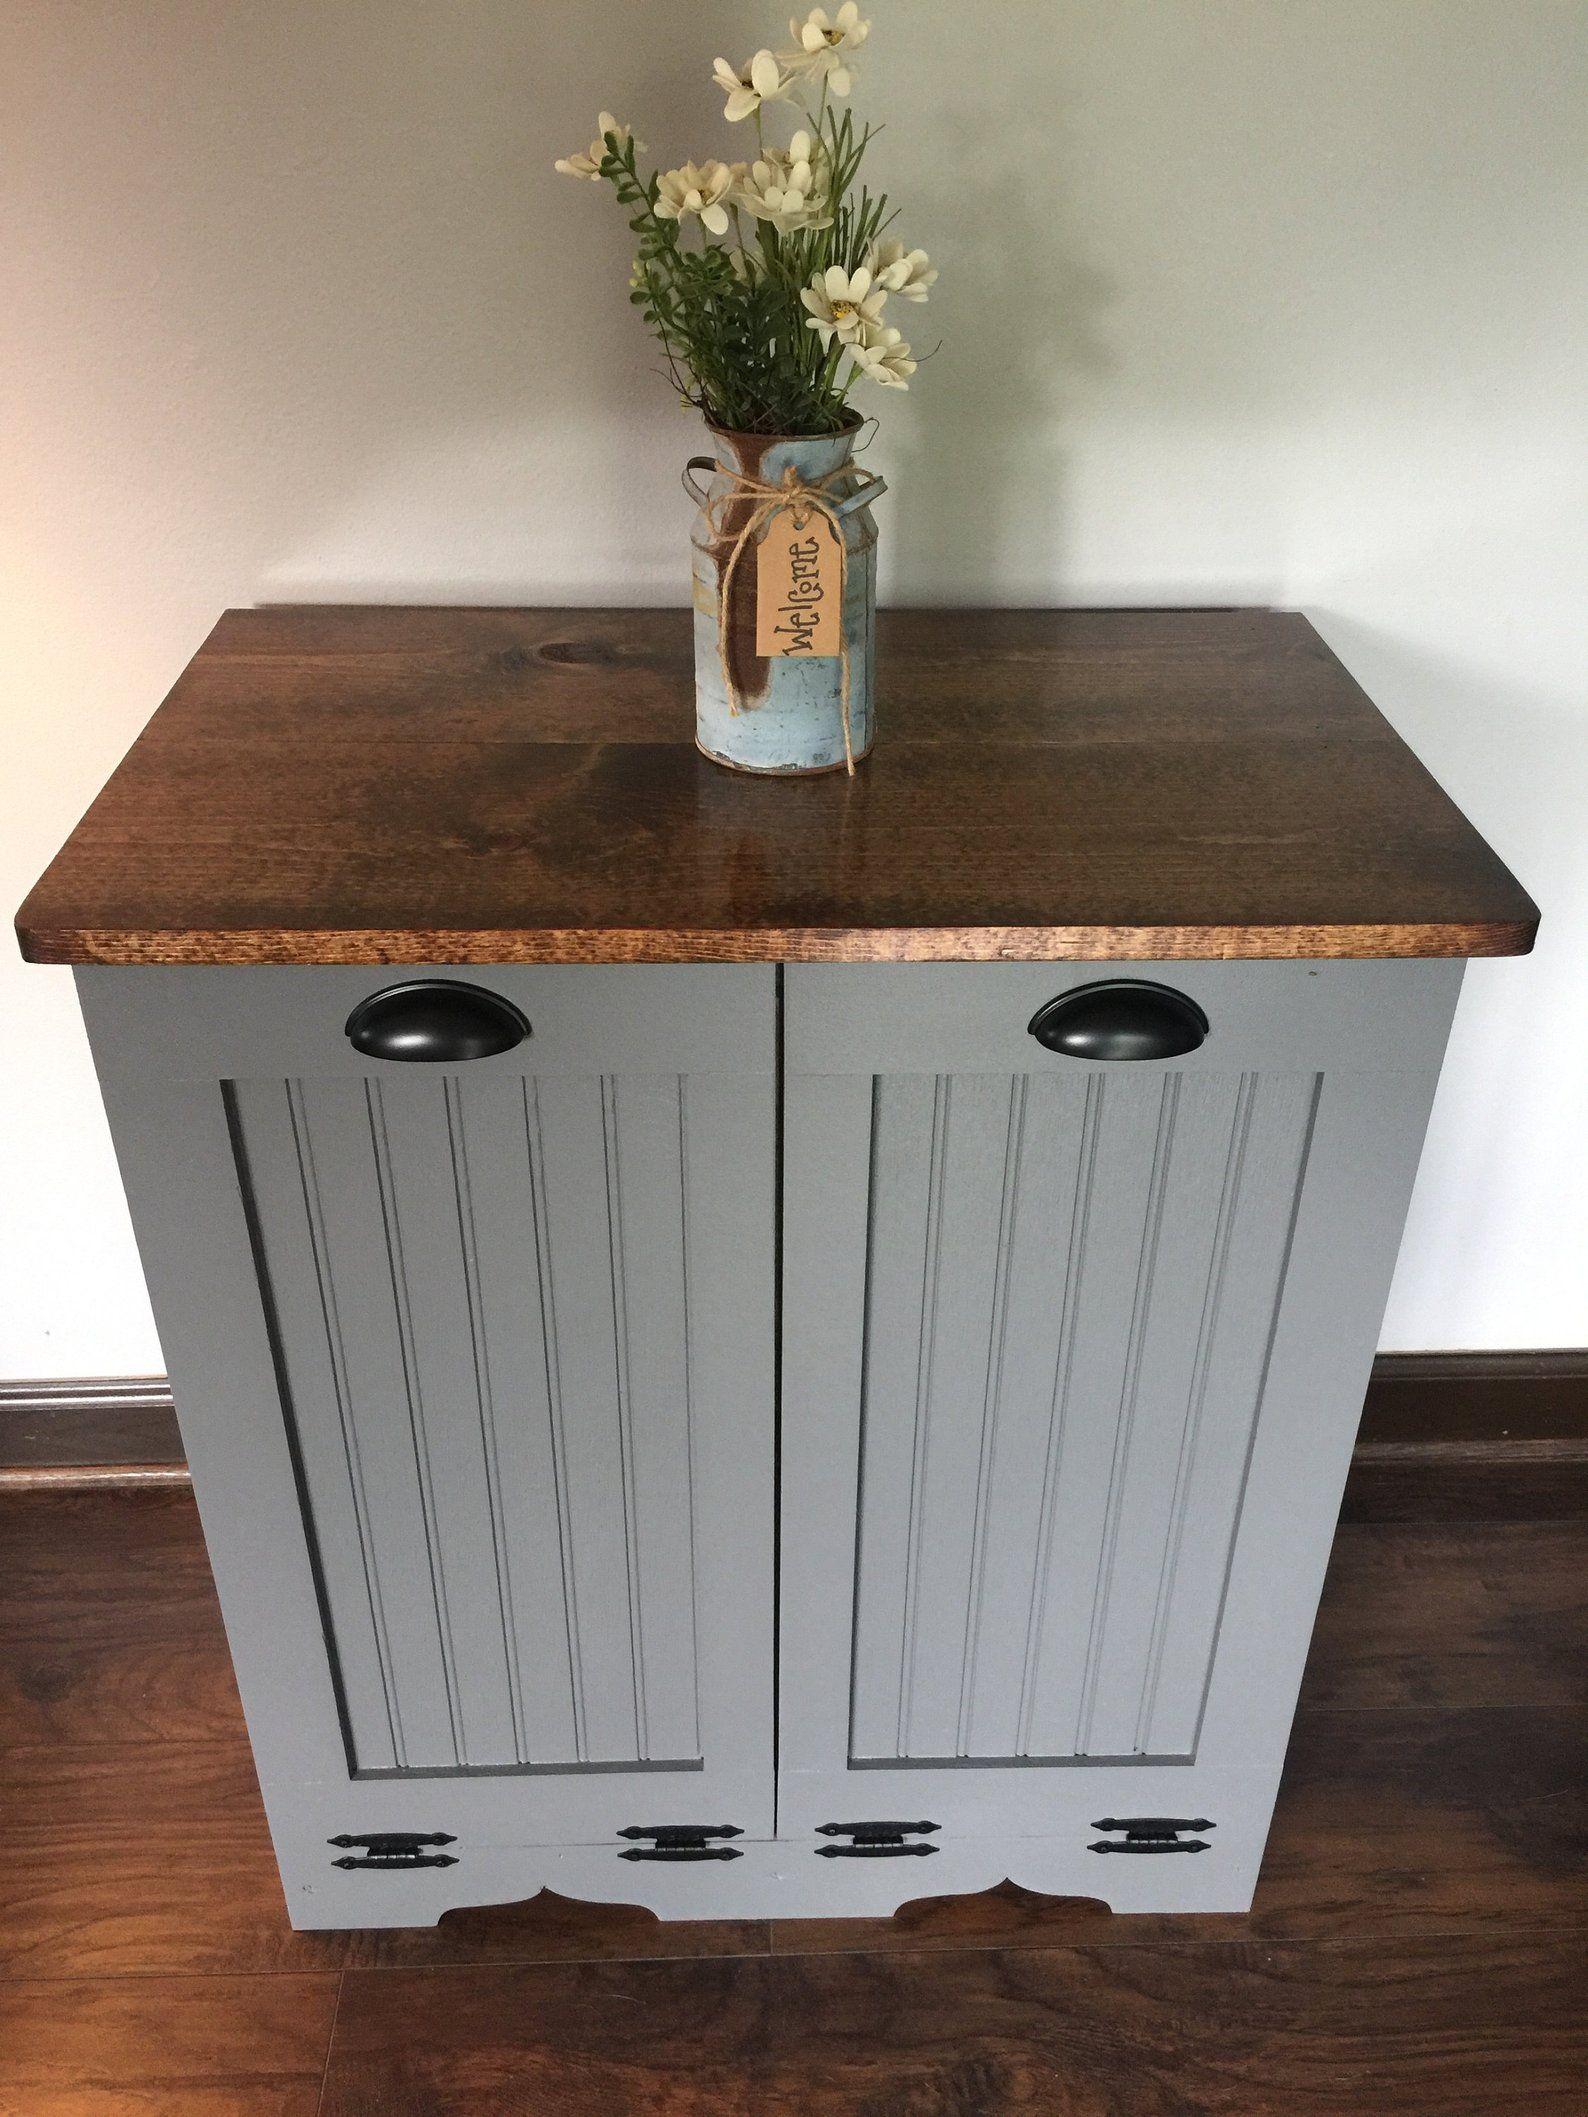 Double Trash Bin Tilt Out Door Wood Trash Recycle Bin Etsy Trash And Recycling Bin Recycling Bins Trash Bins